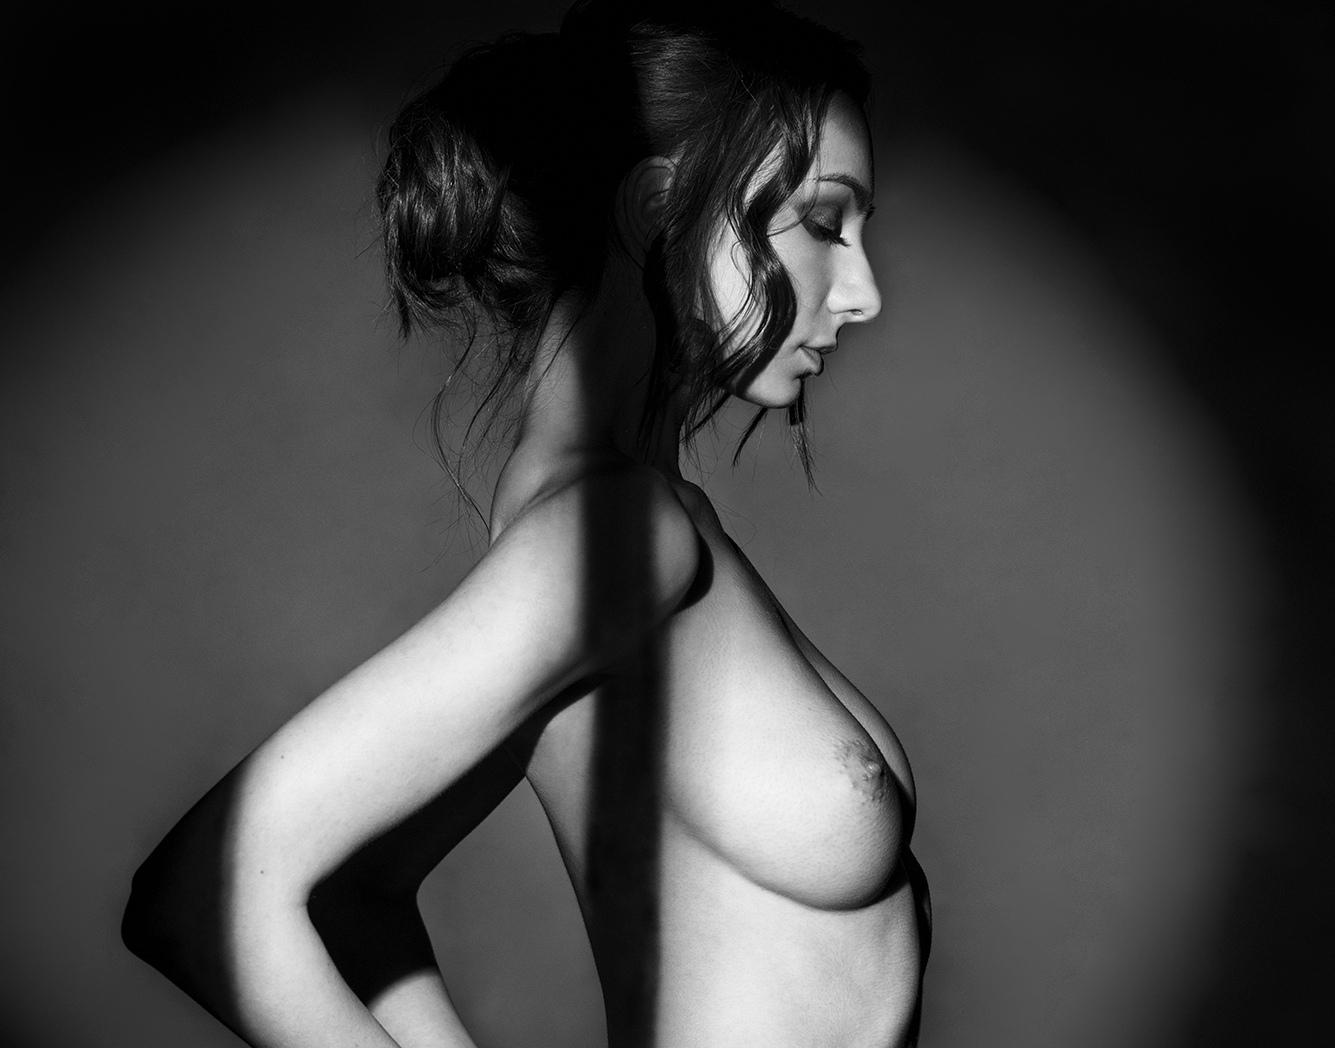 Margo Amp by Viktor Tsirkin